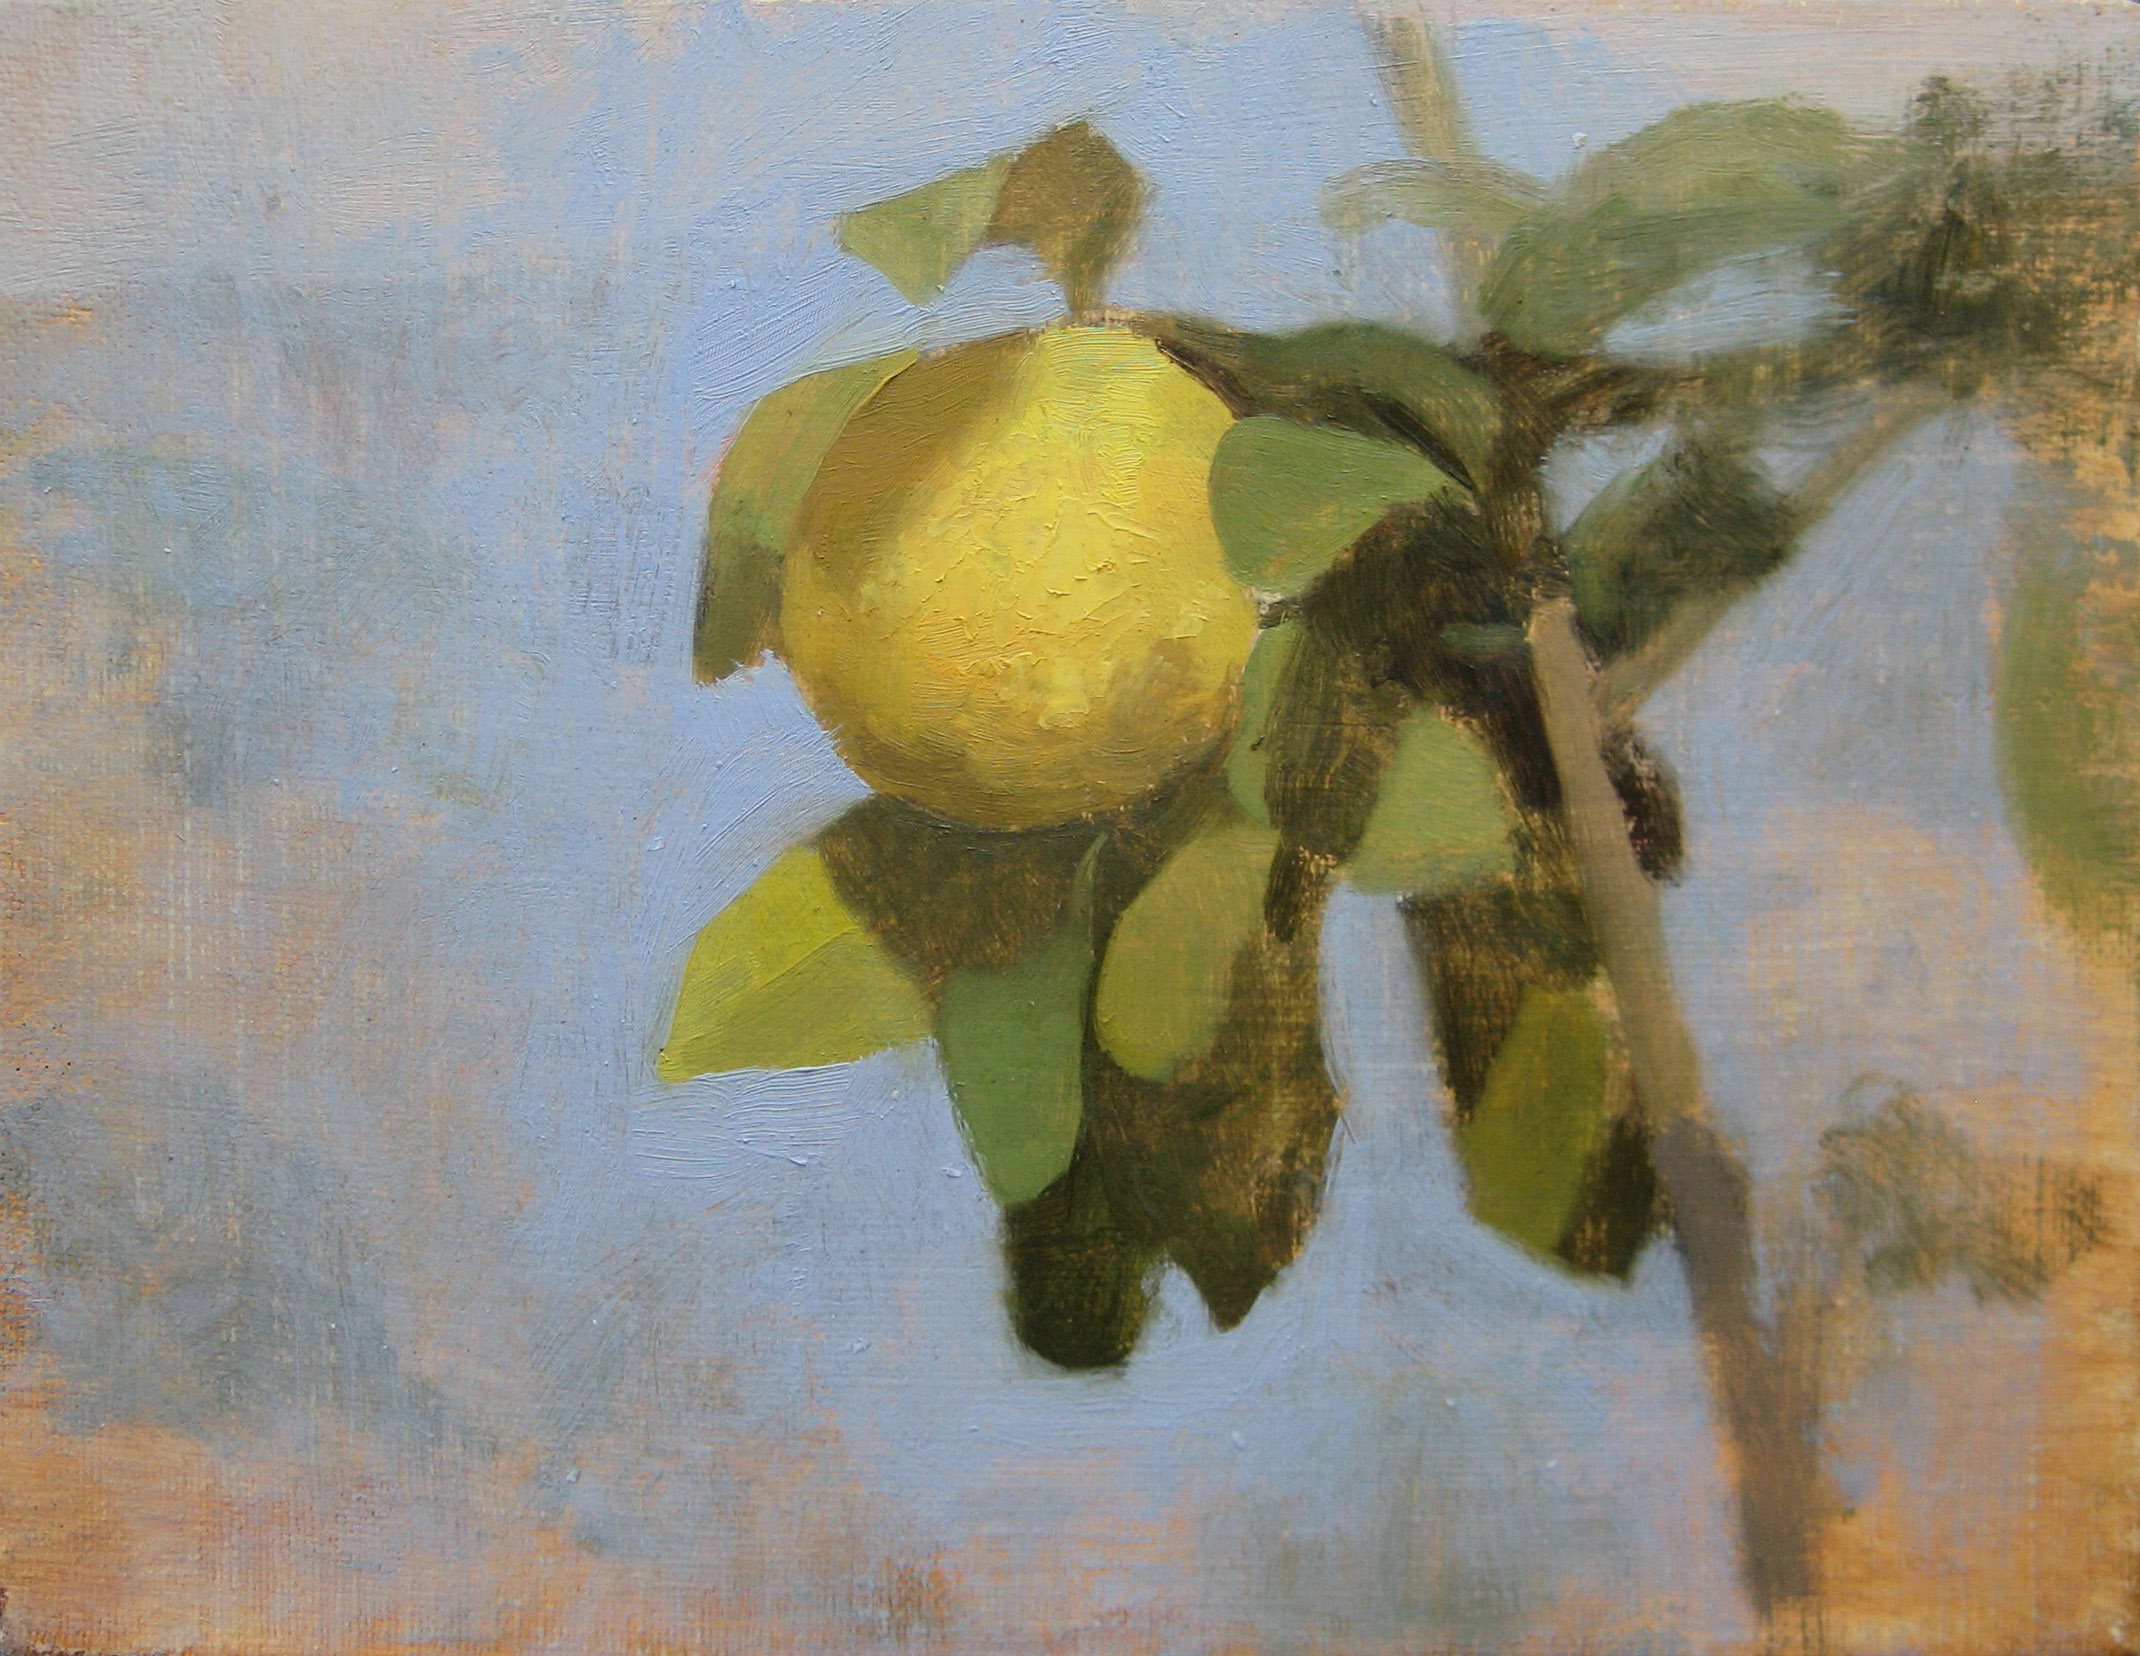 Oil on Canvas, 20X15 cm, 2011